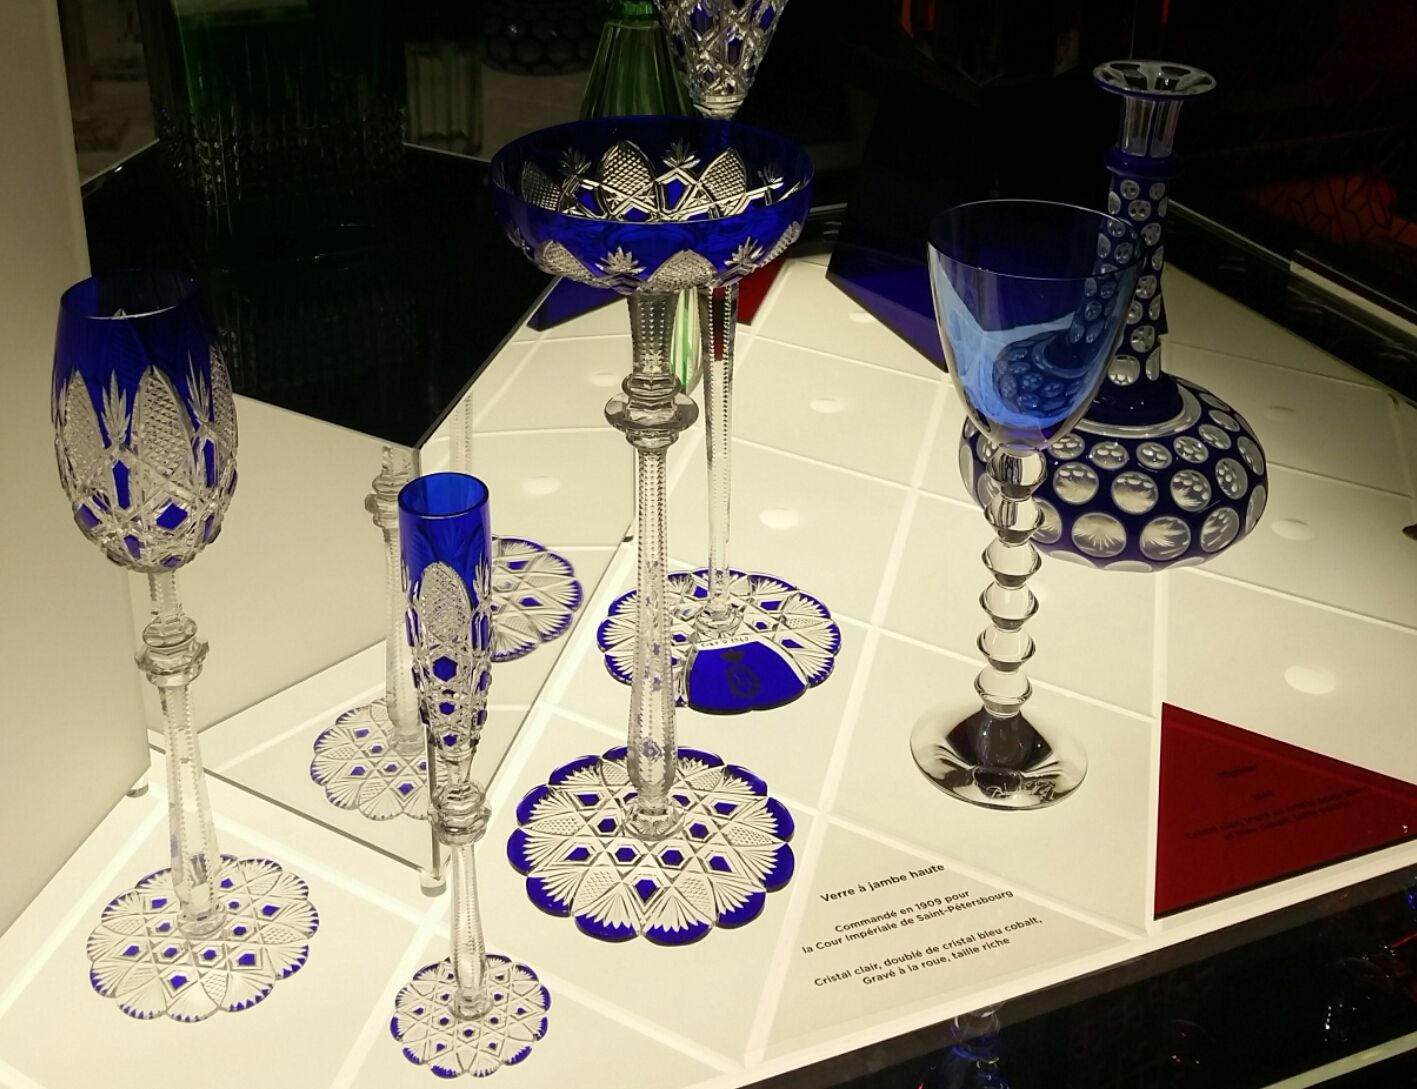 Cristallerie Baccarat Visite